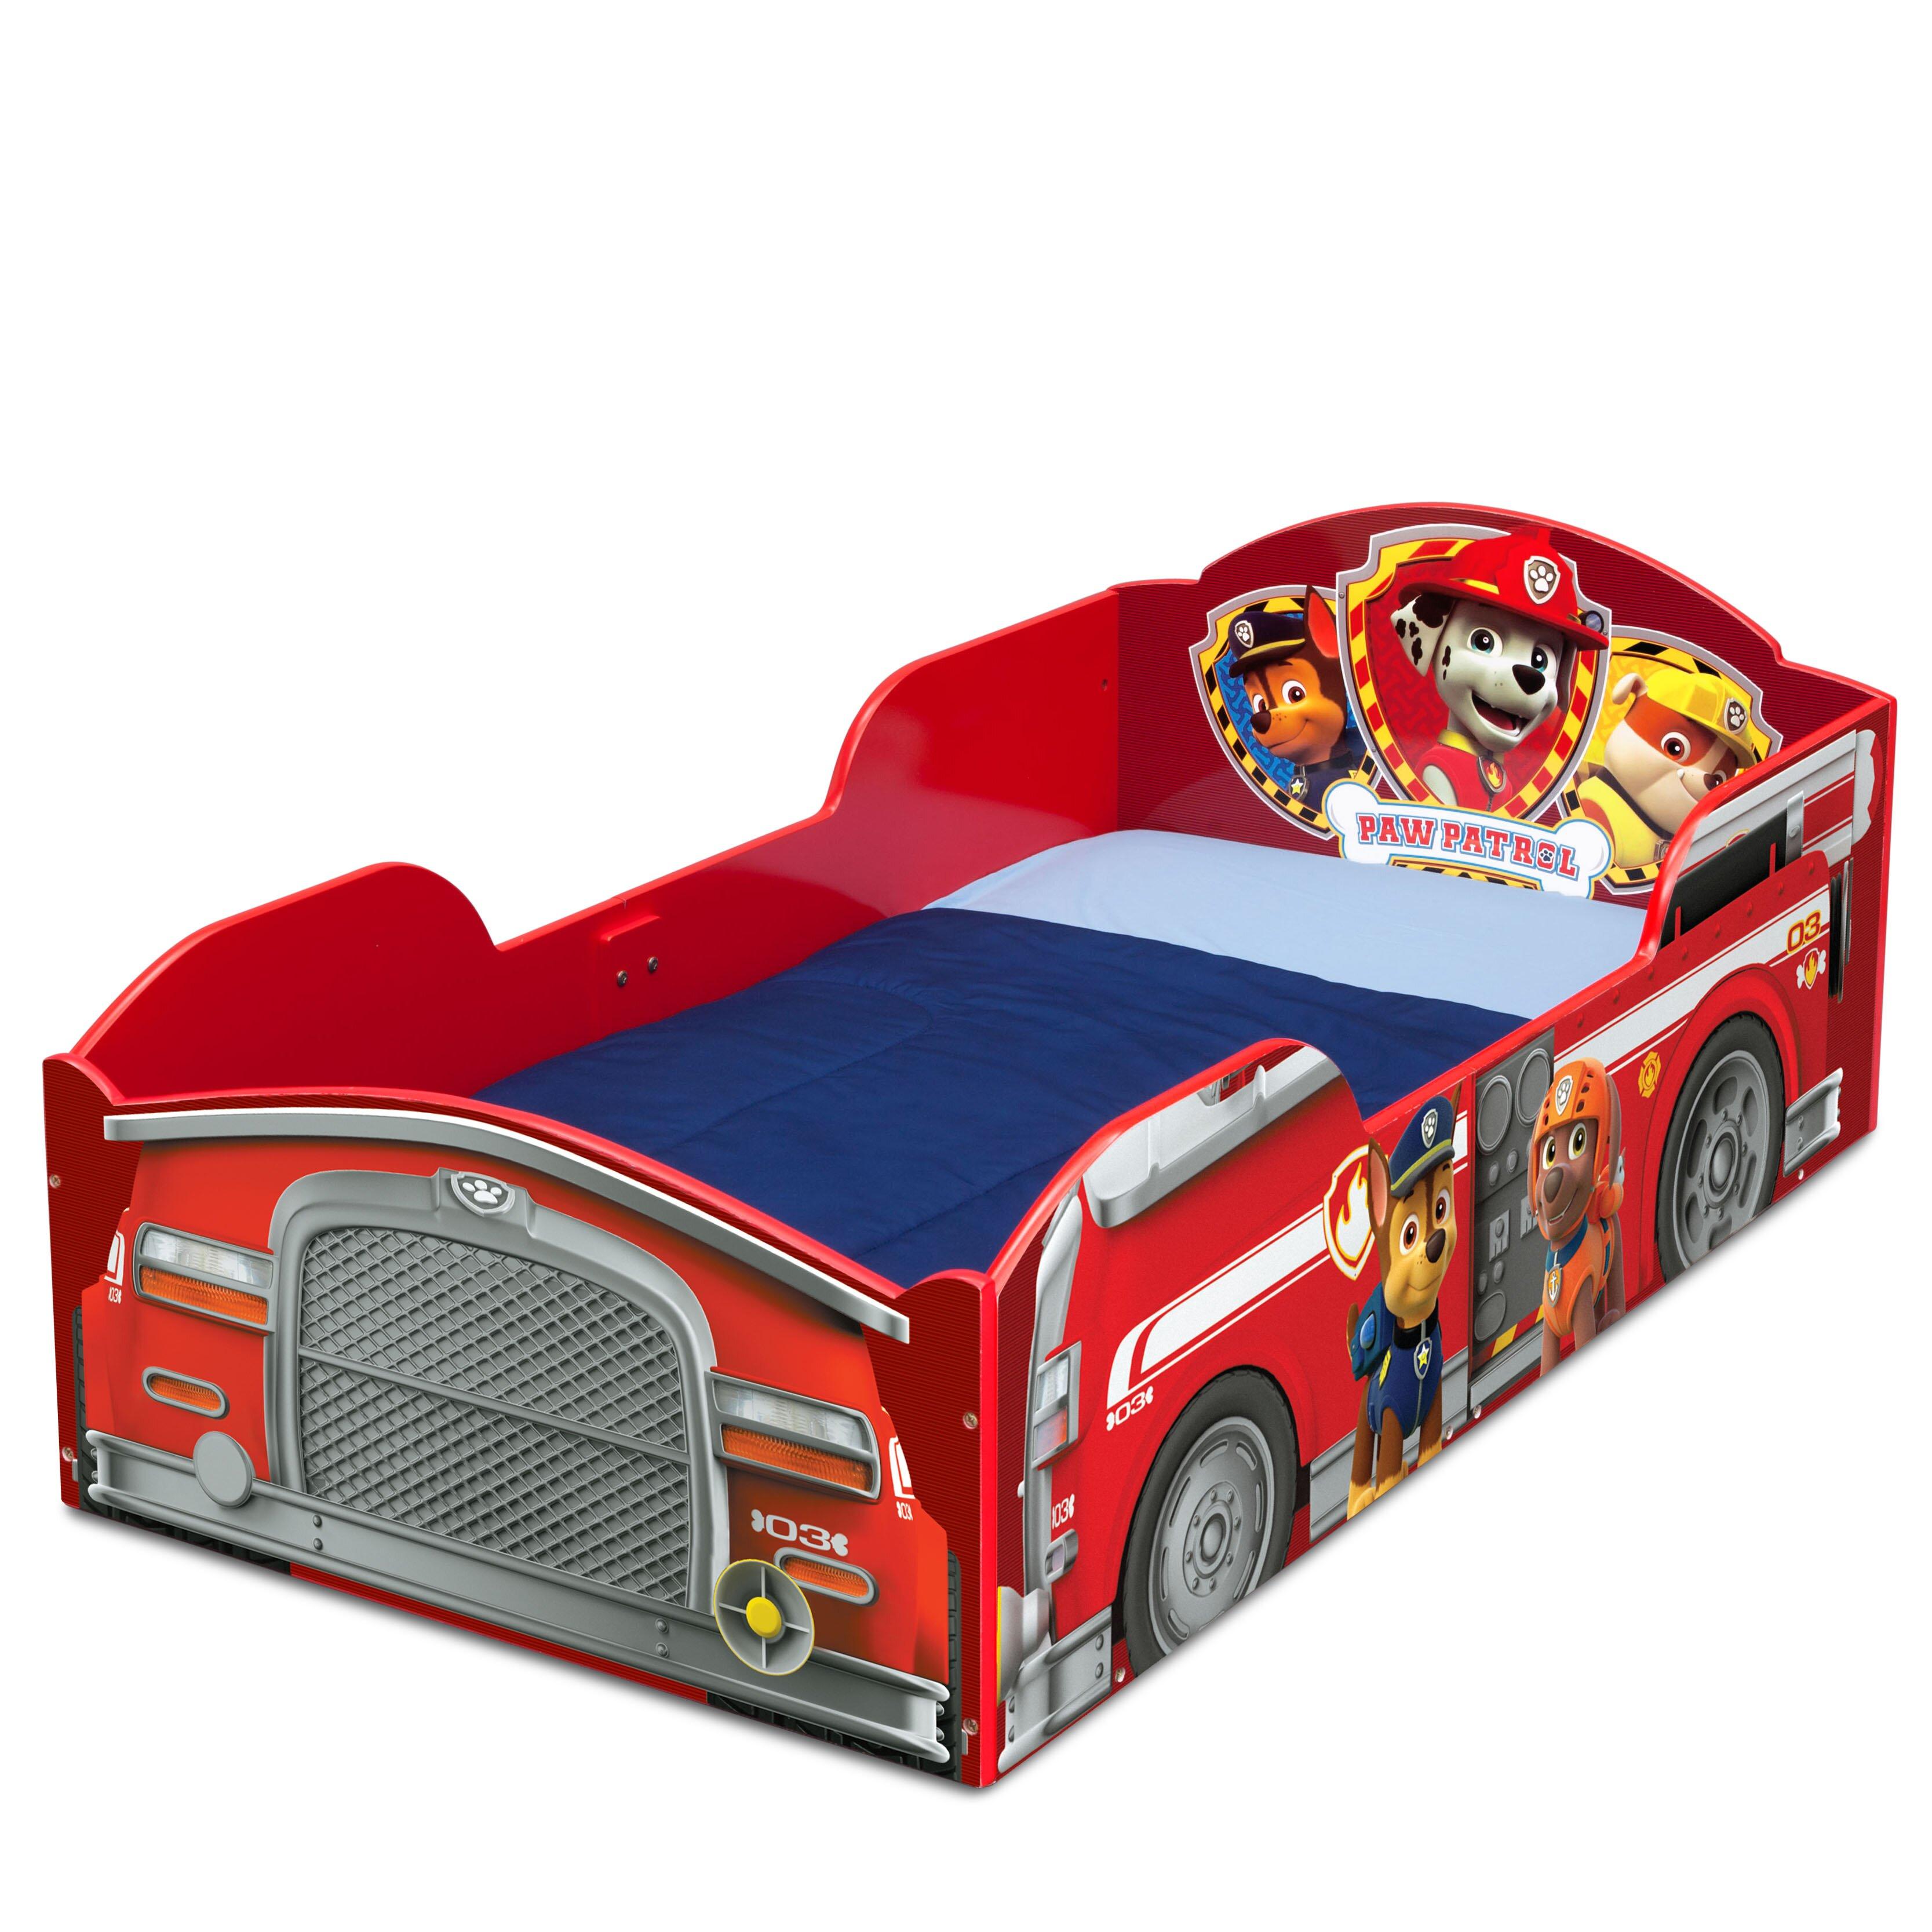 Little Tikes Bedroom Furniture Delta Children Nick Jr Paw Patrol Toddler Bed Reviews Wayfair